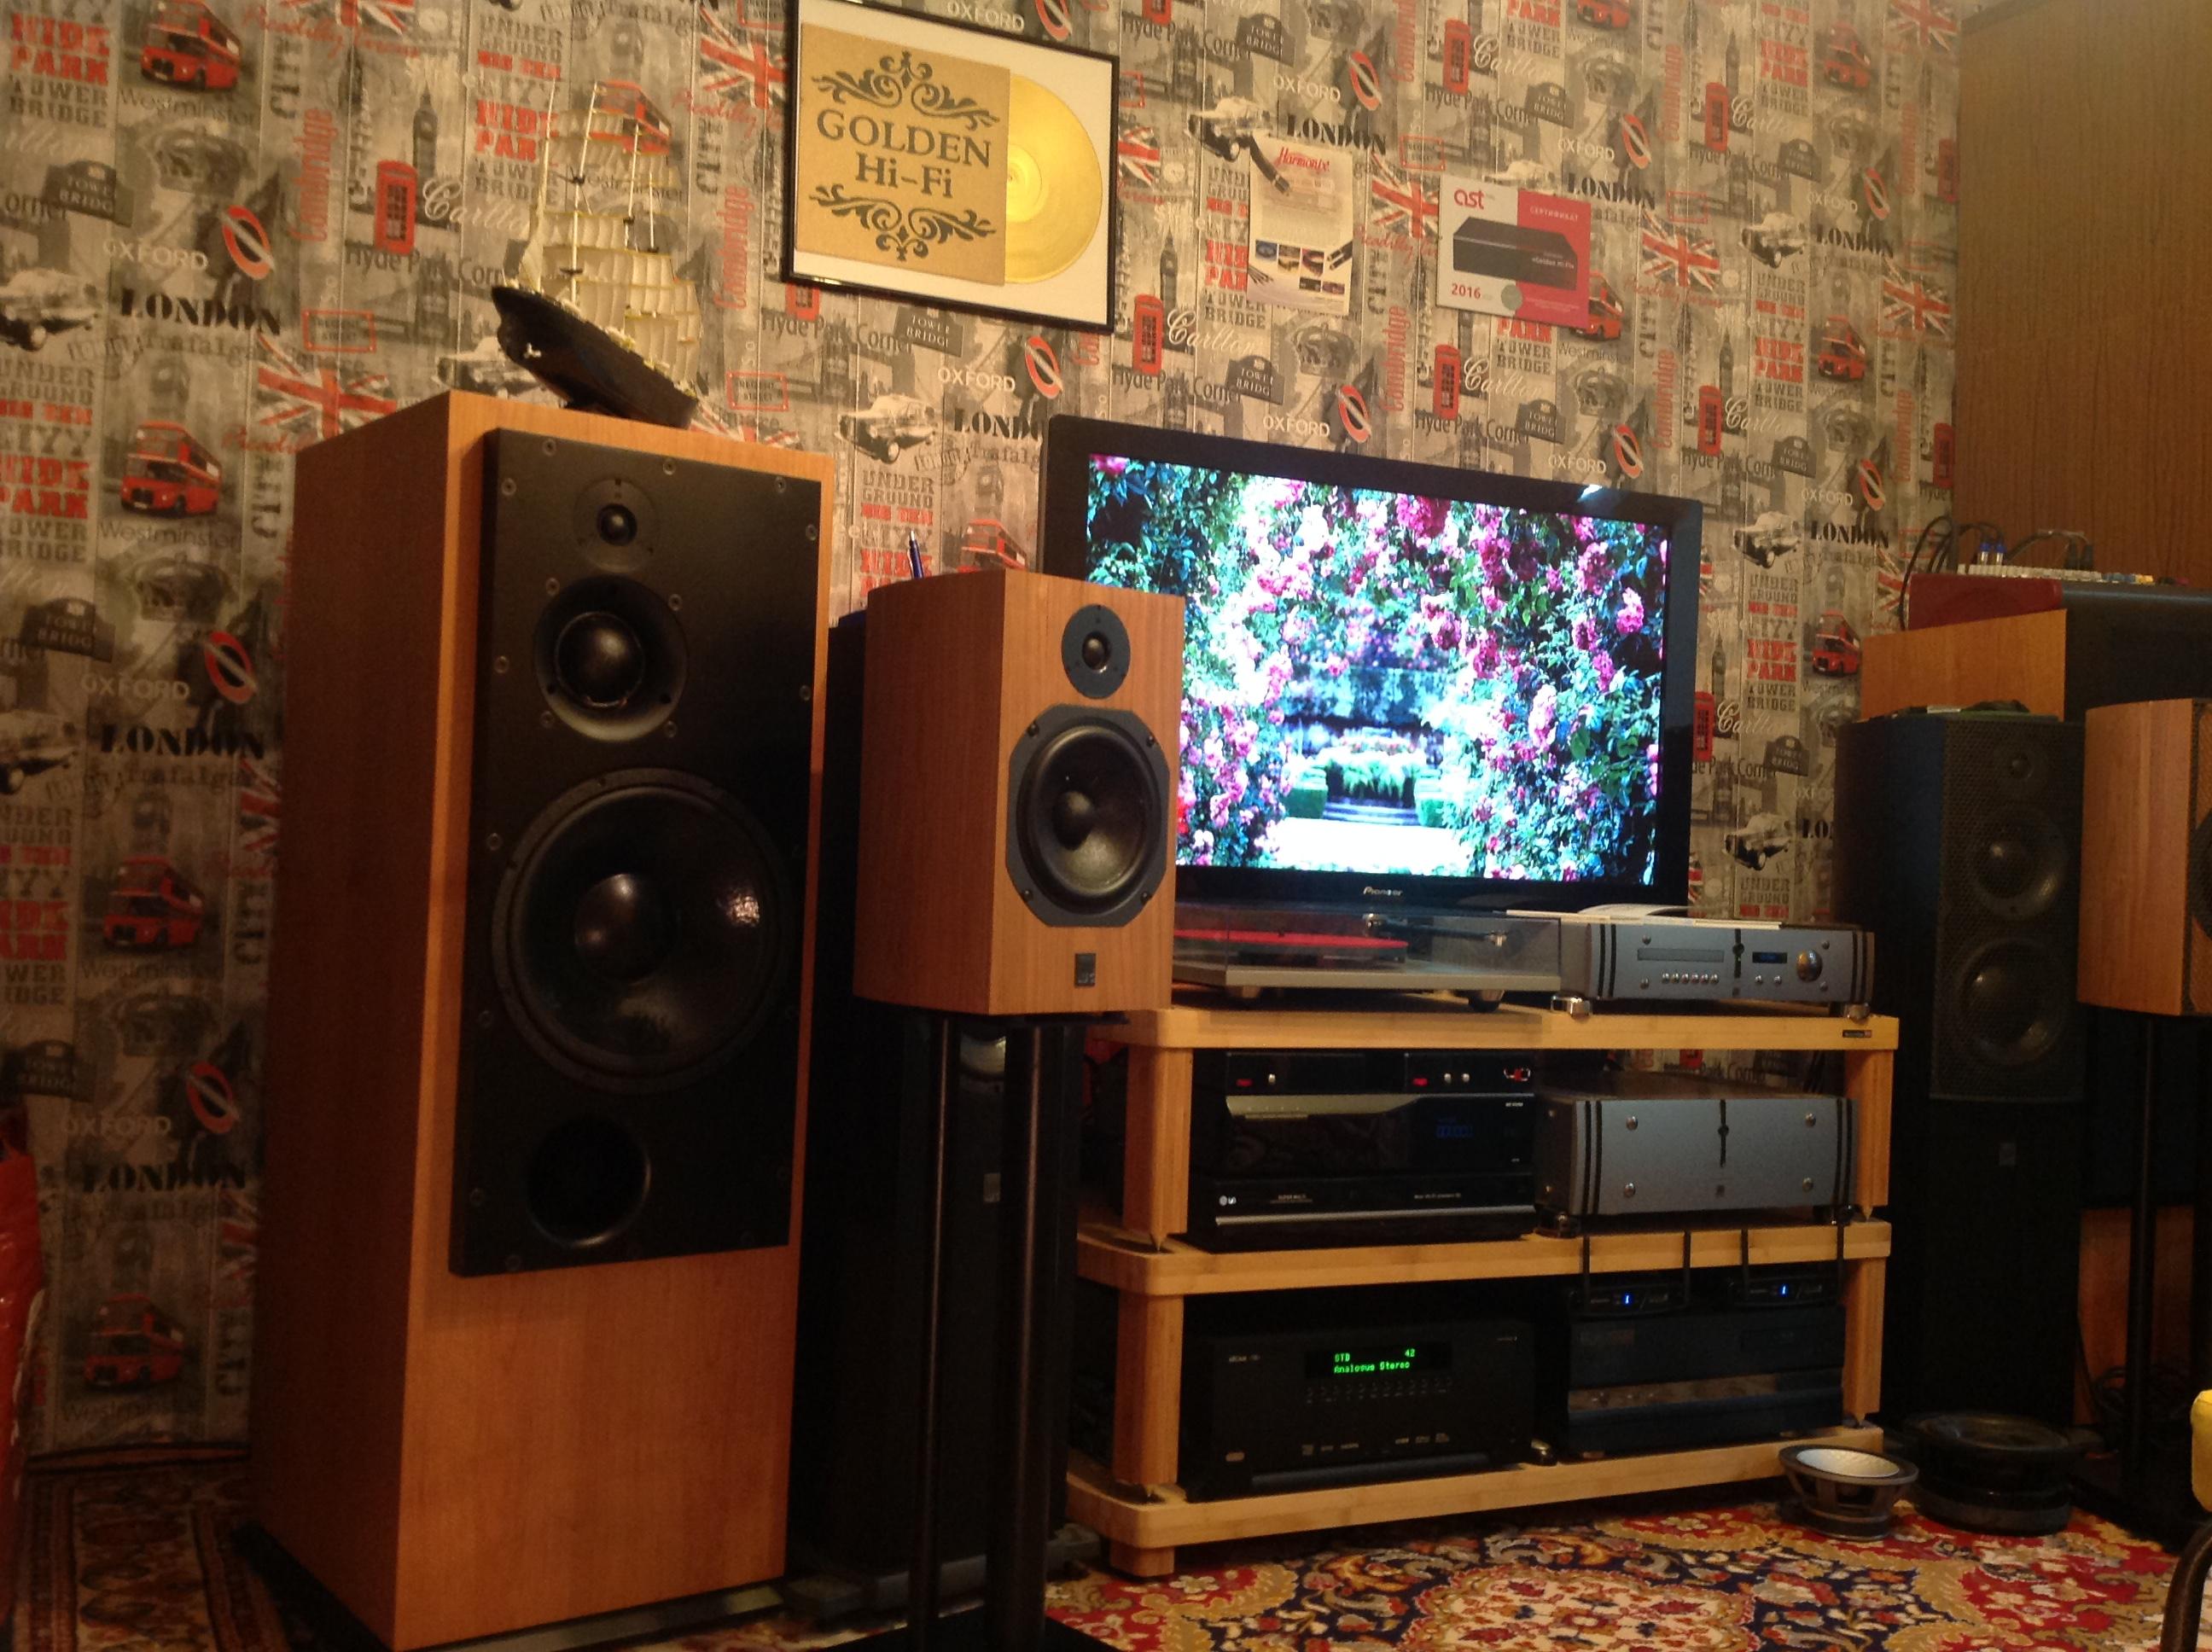 Домашний шоурум Professional Light and Sound